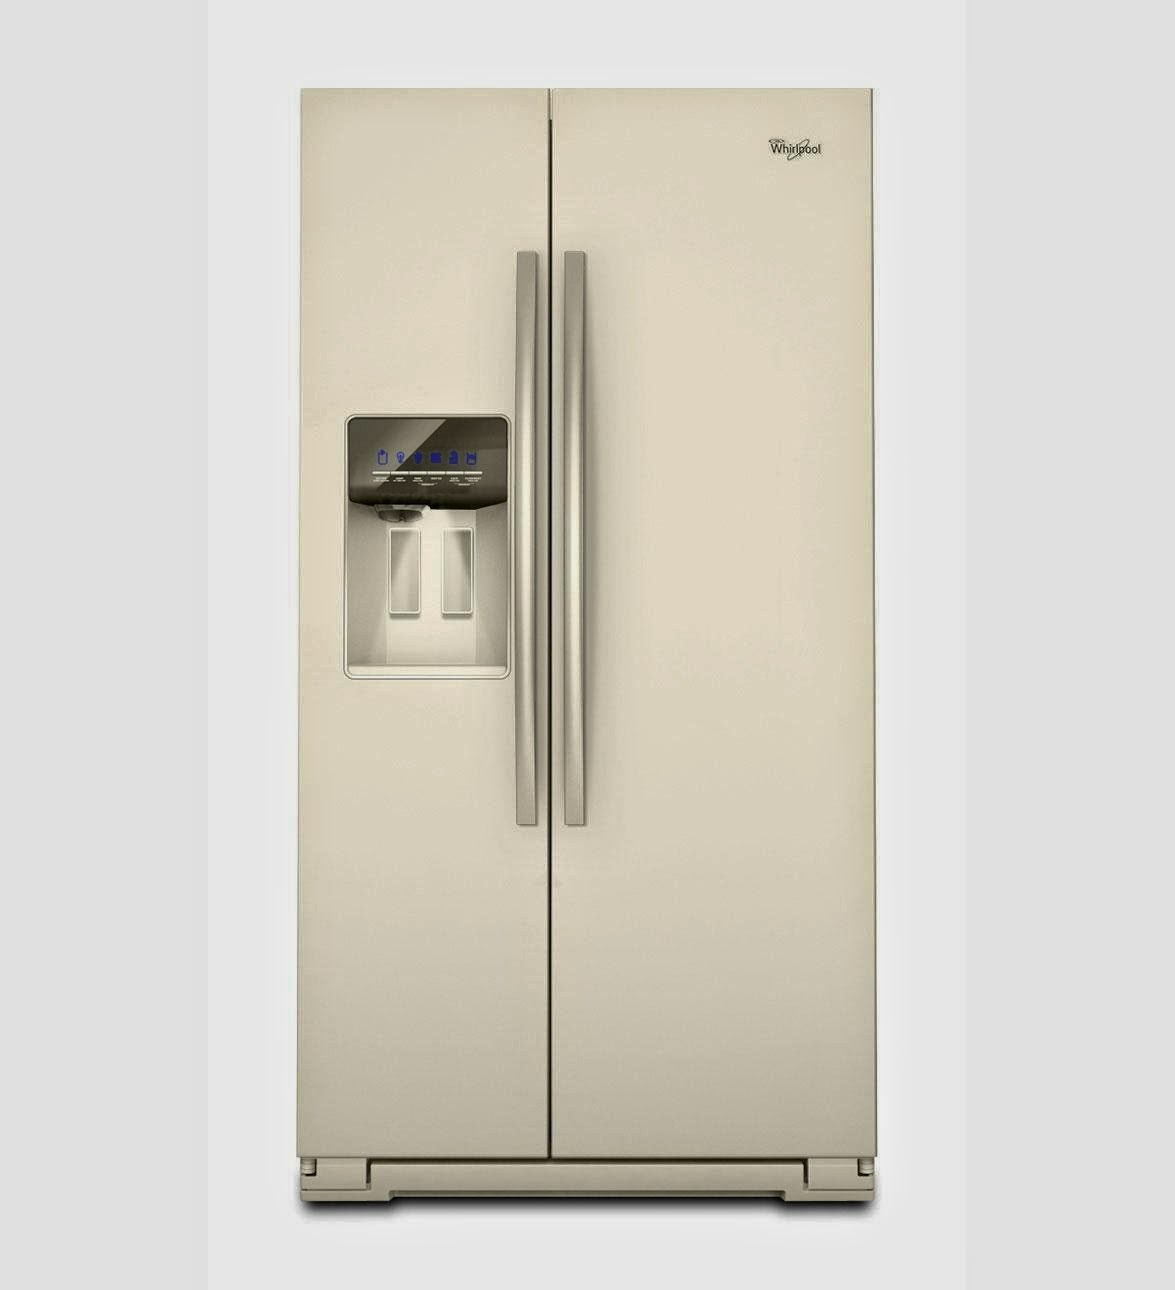 Whirlpool refrigerators whirlpool side by side refrigerators - Whirlpool side by side ...